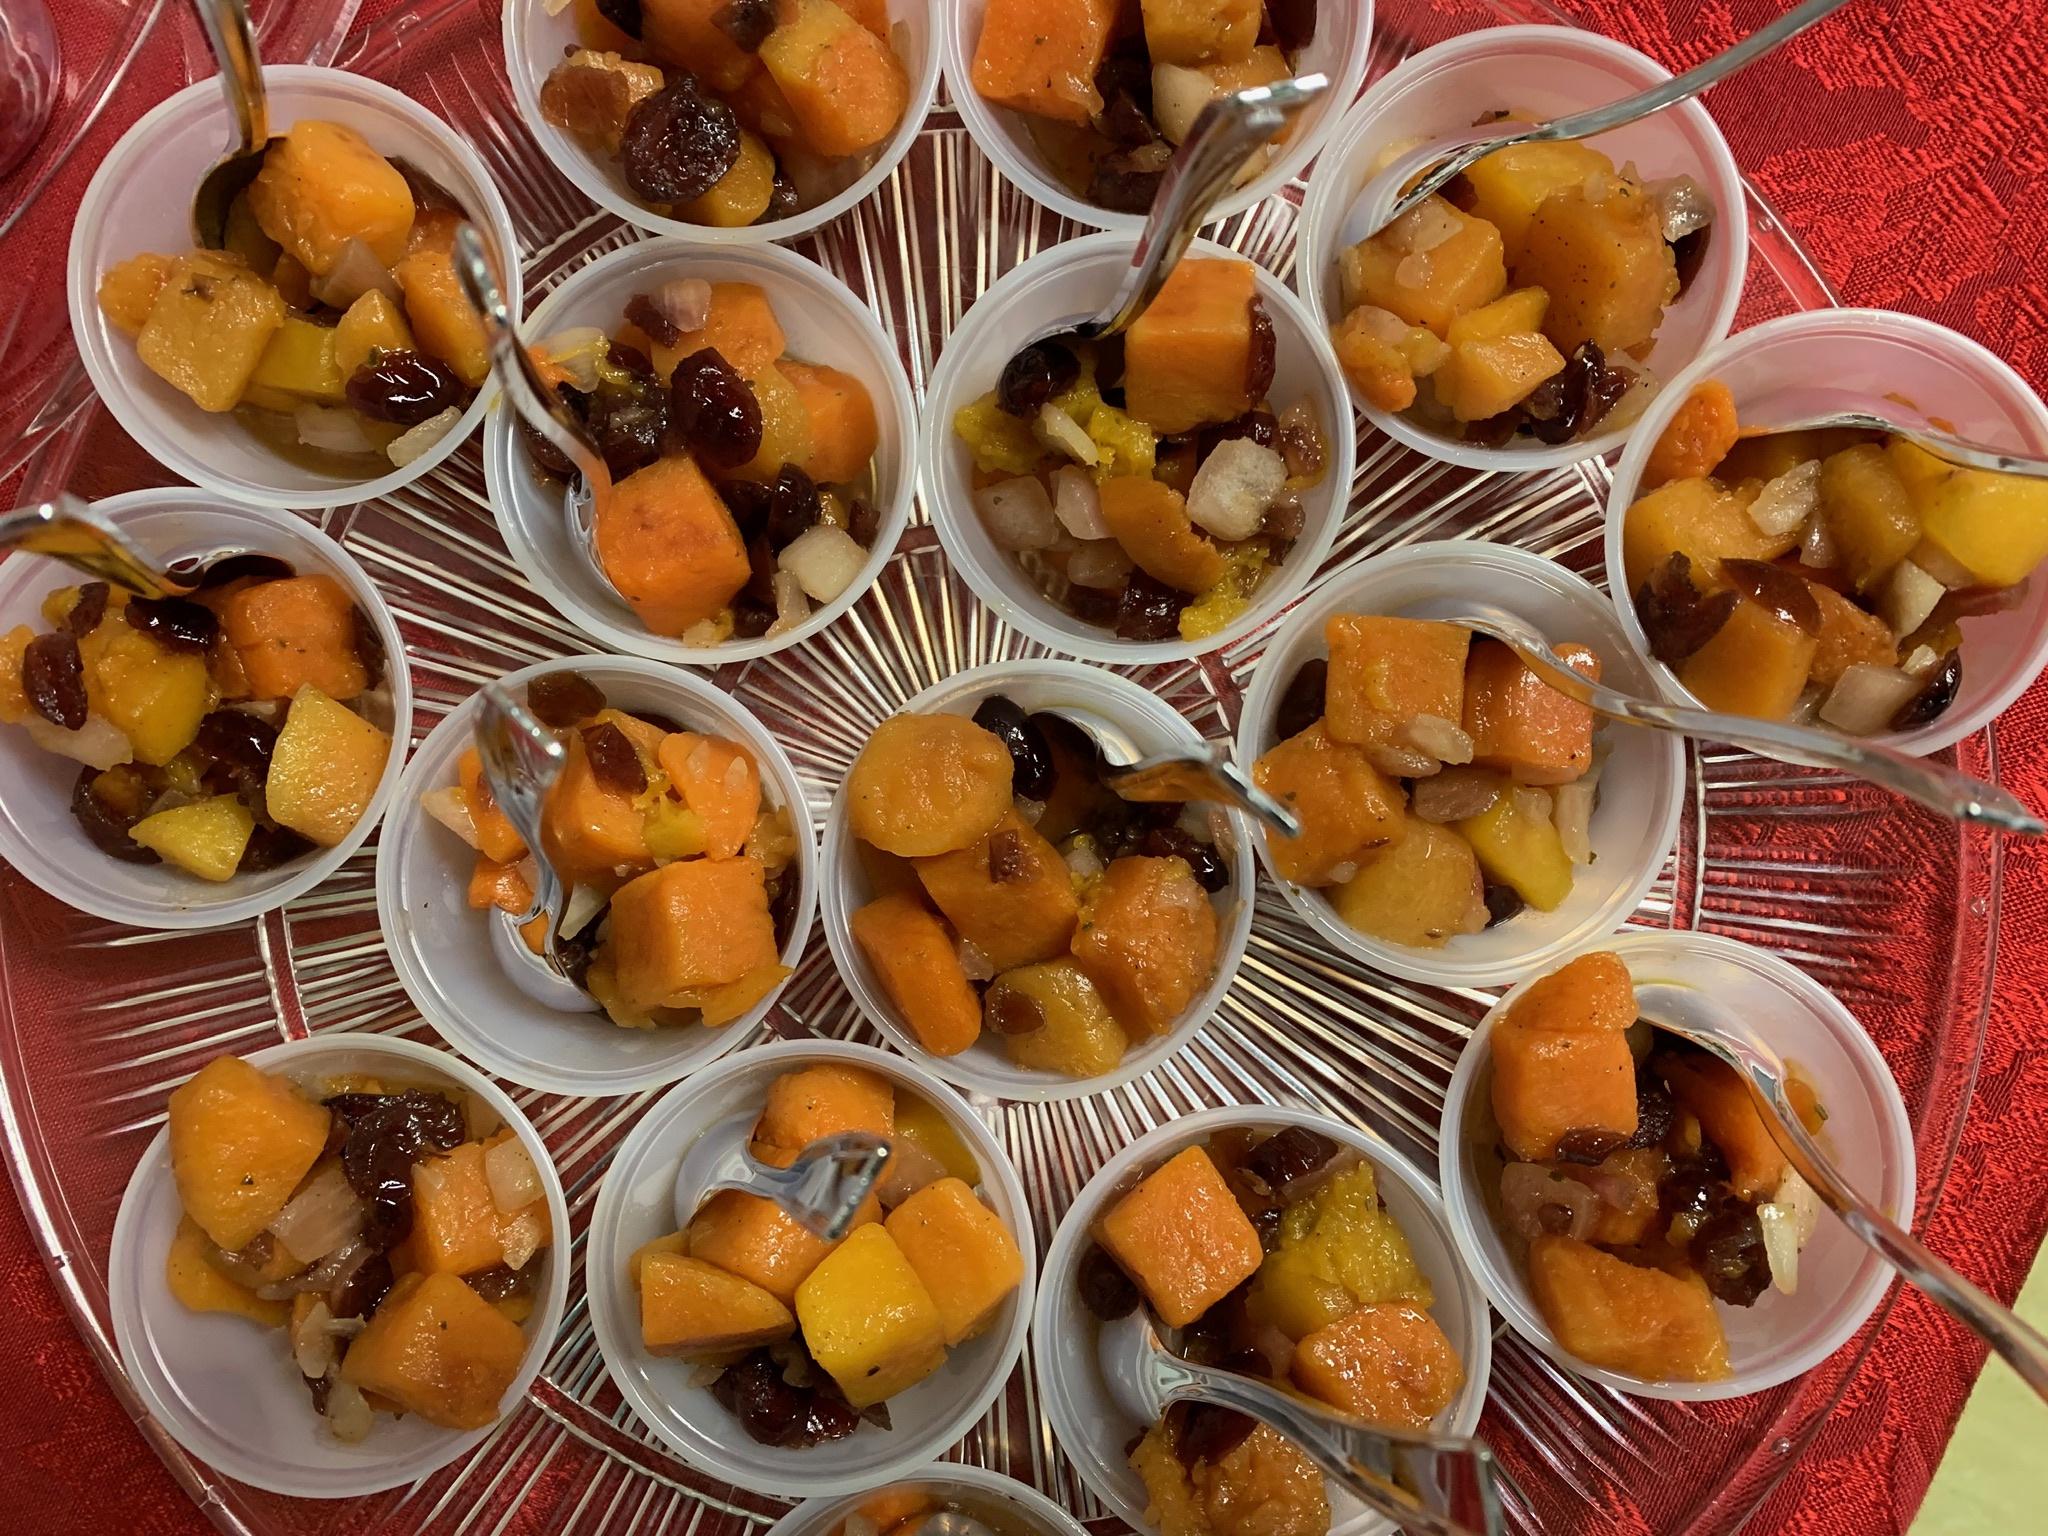 Healthy Holiday Tasting - December 2019